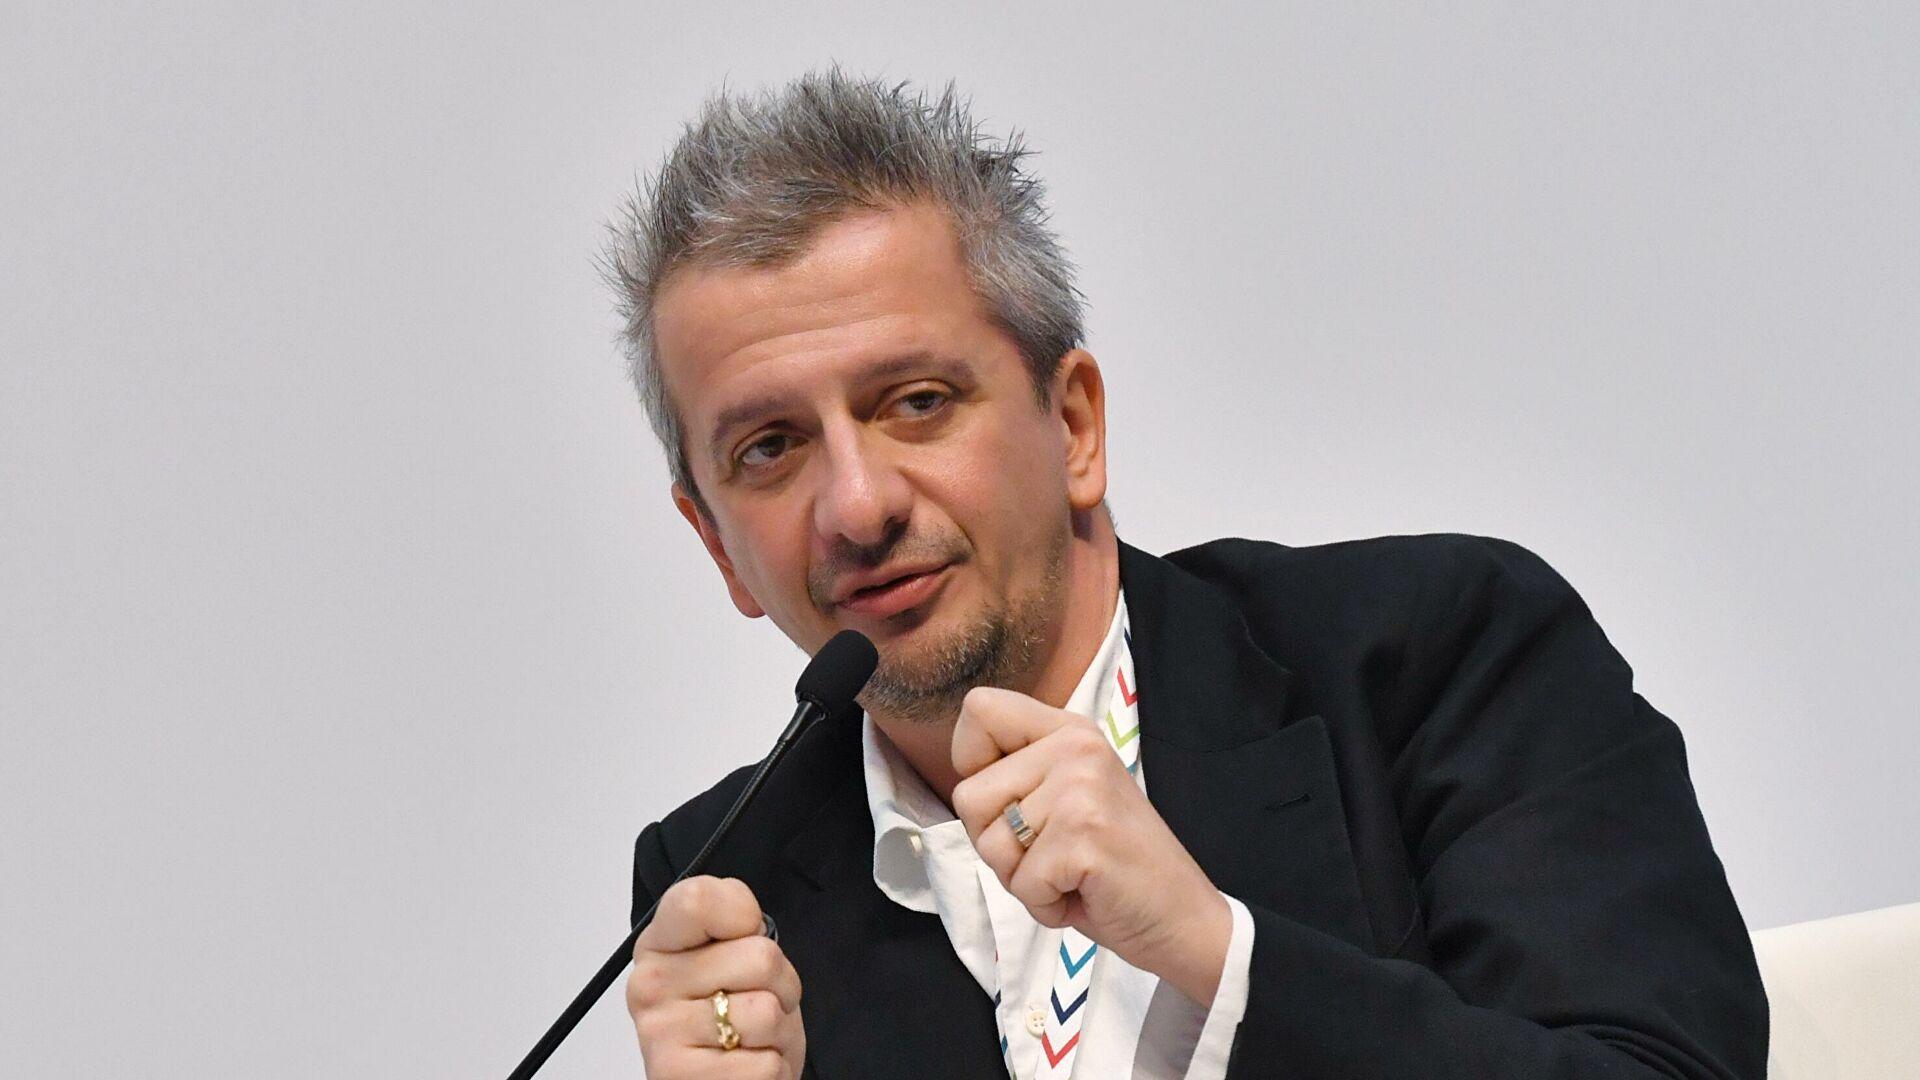 Константин Богомолов. Фото с сайта www.ria.ru